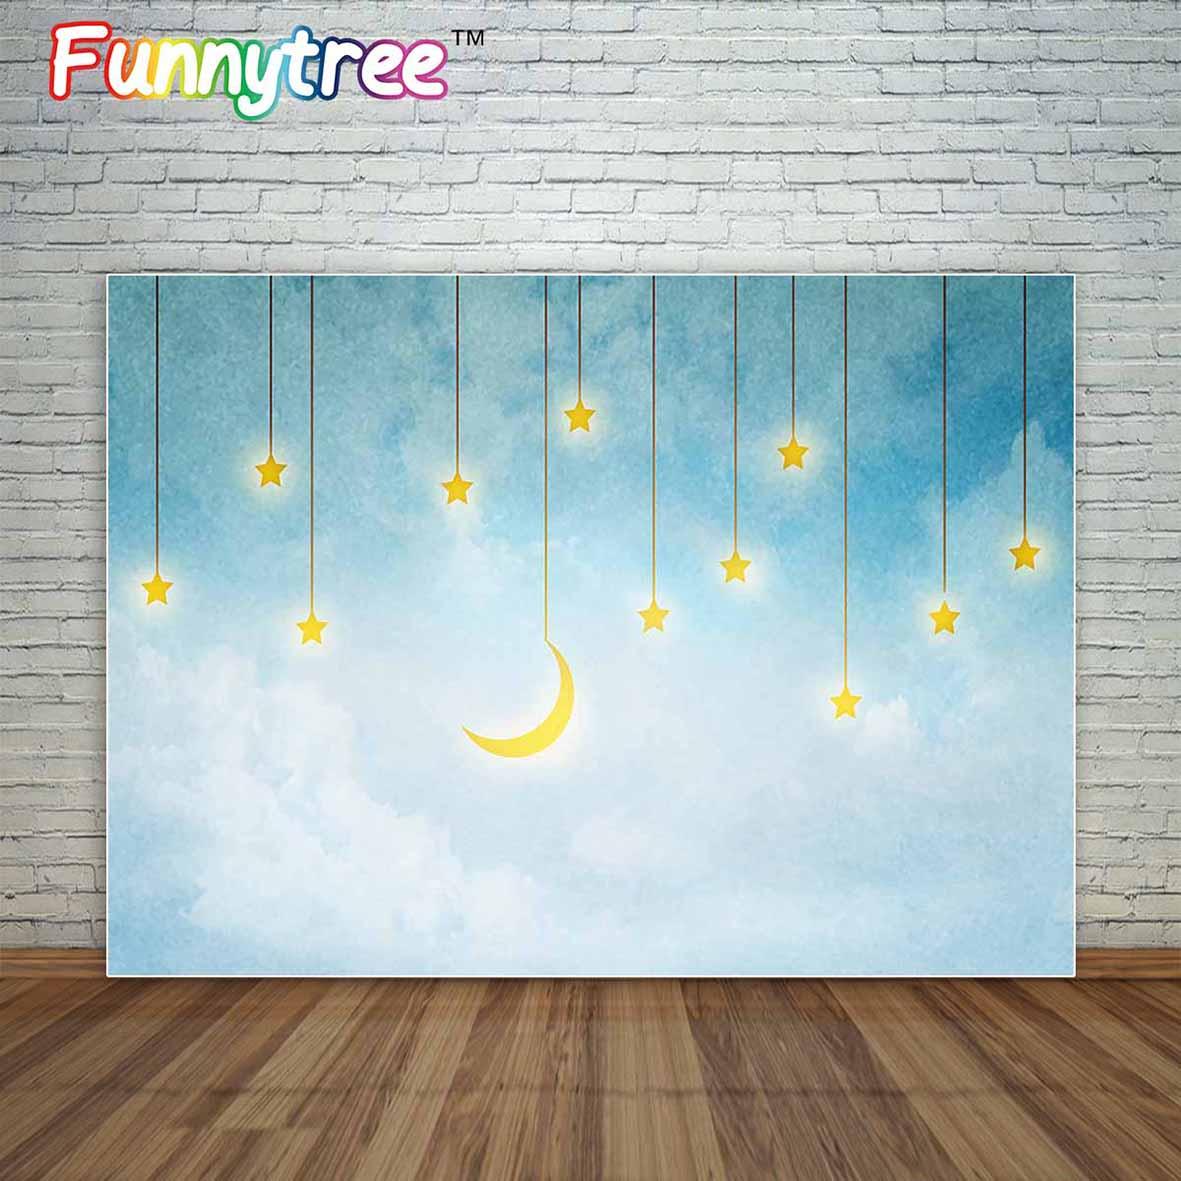 Allenjoy blue sky with shiny moon and stars backdrop in vintage style for baby newborn kids photographic background decorations blue sky чаша северный олень